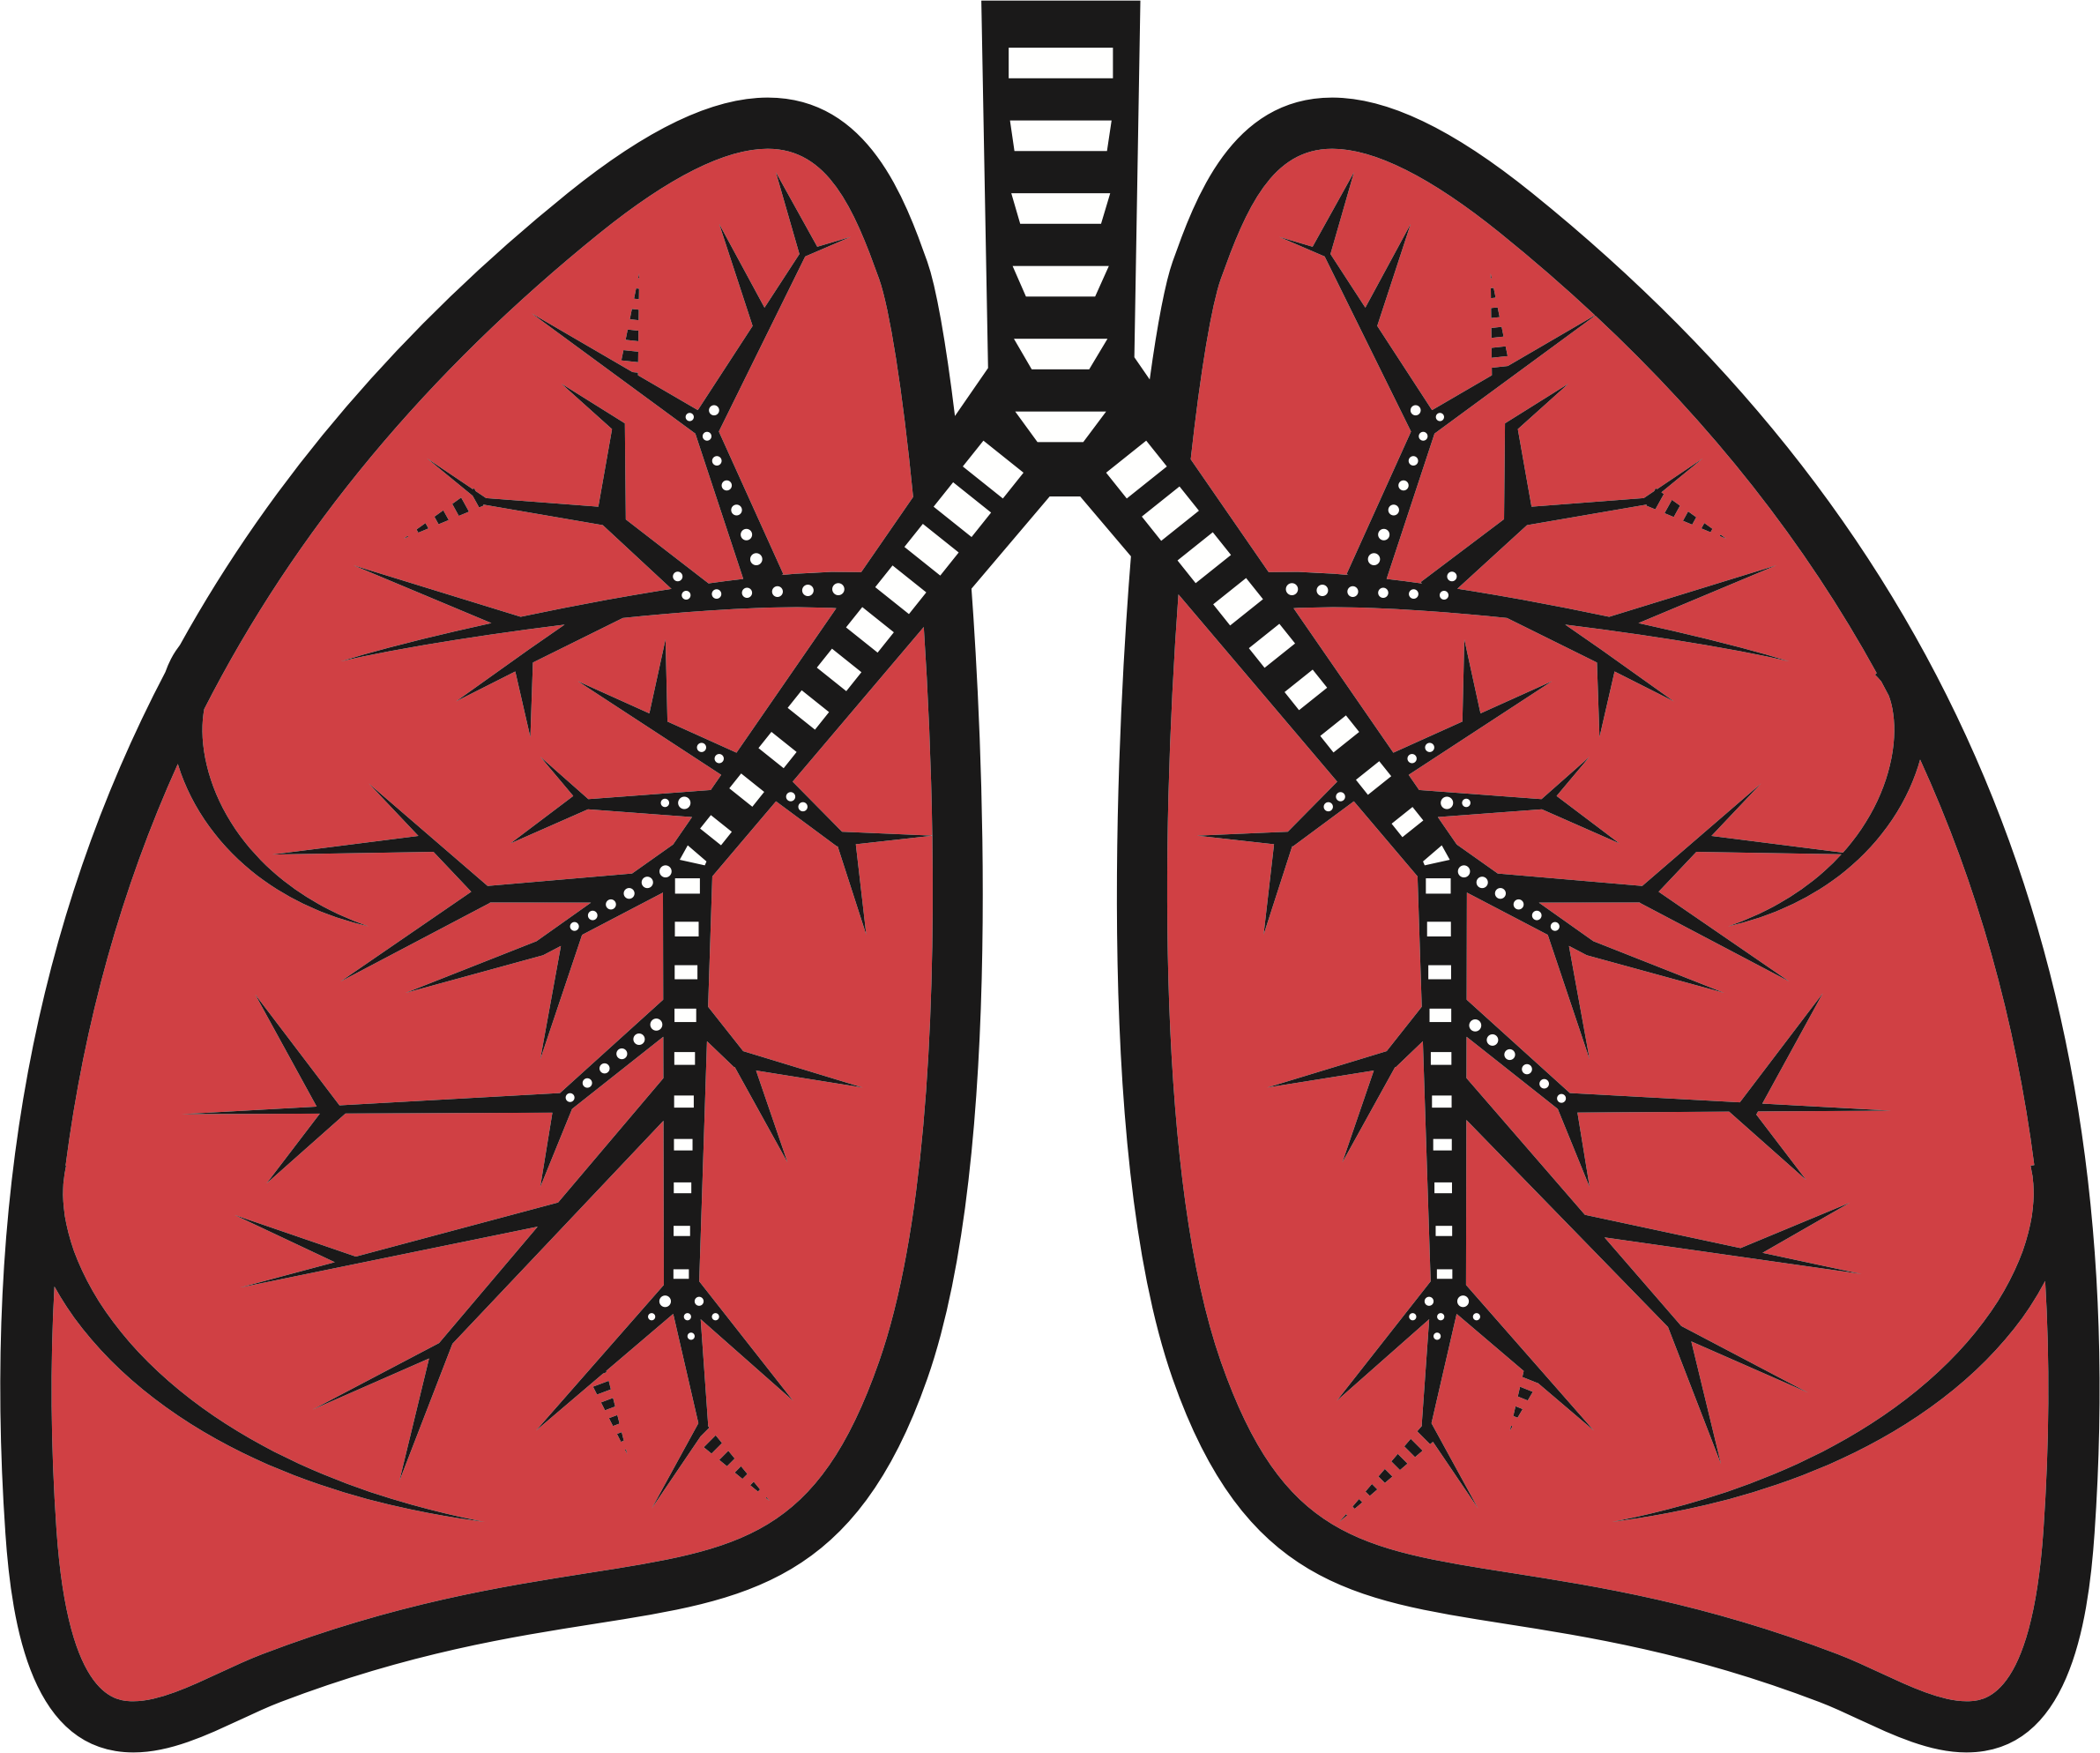 Sad lung